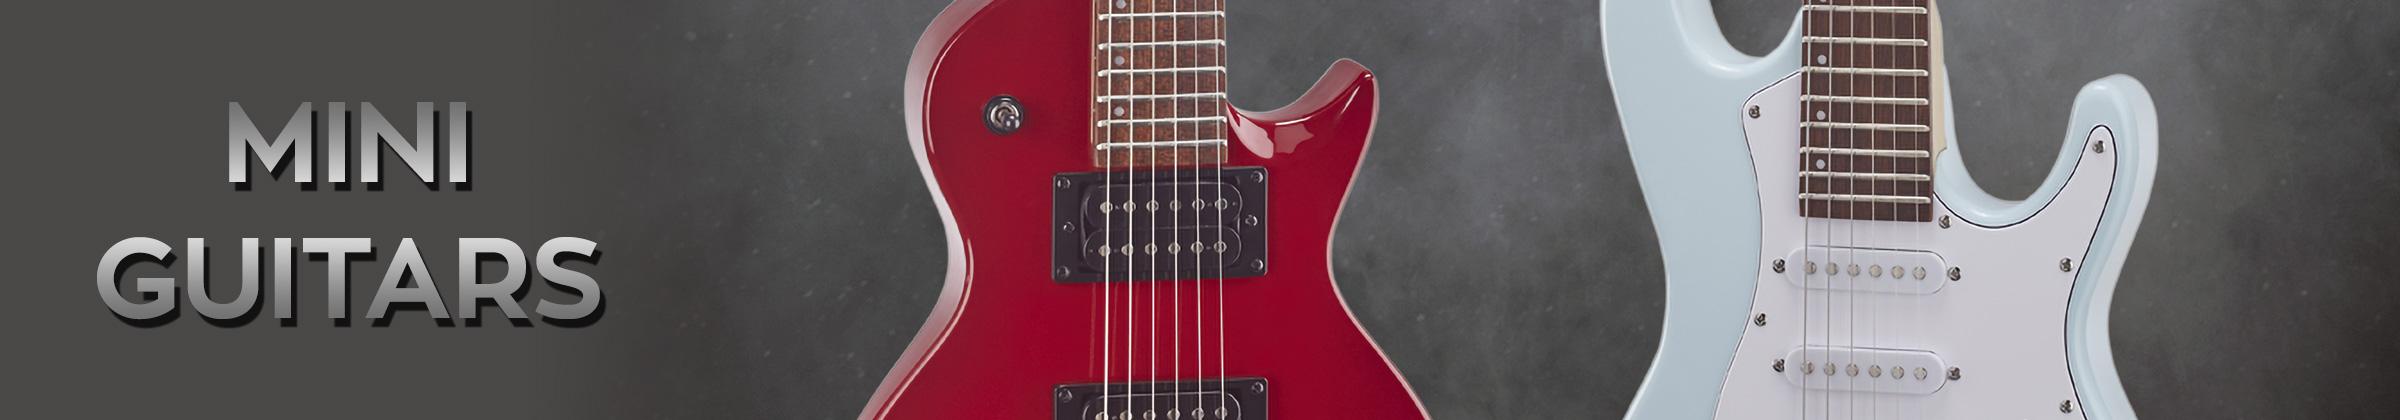 Mitchell Mini Guitars